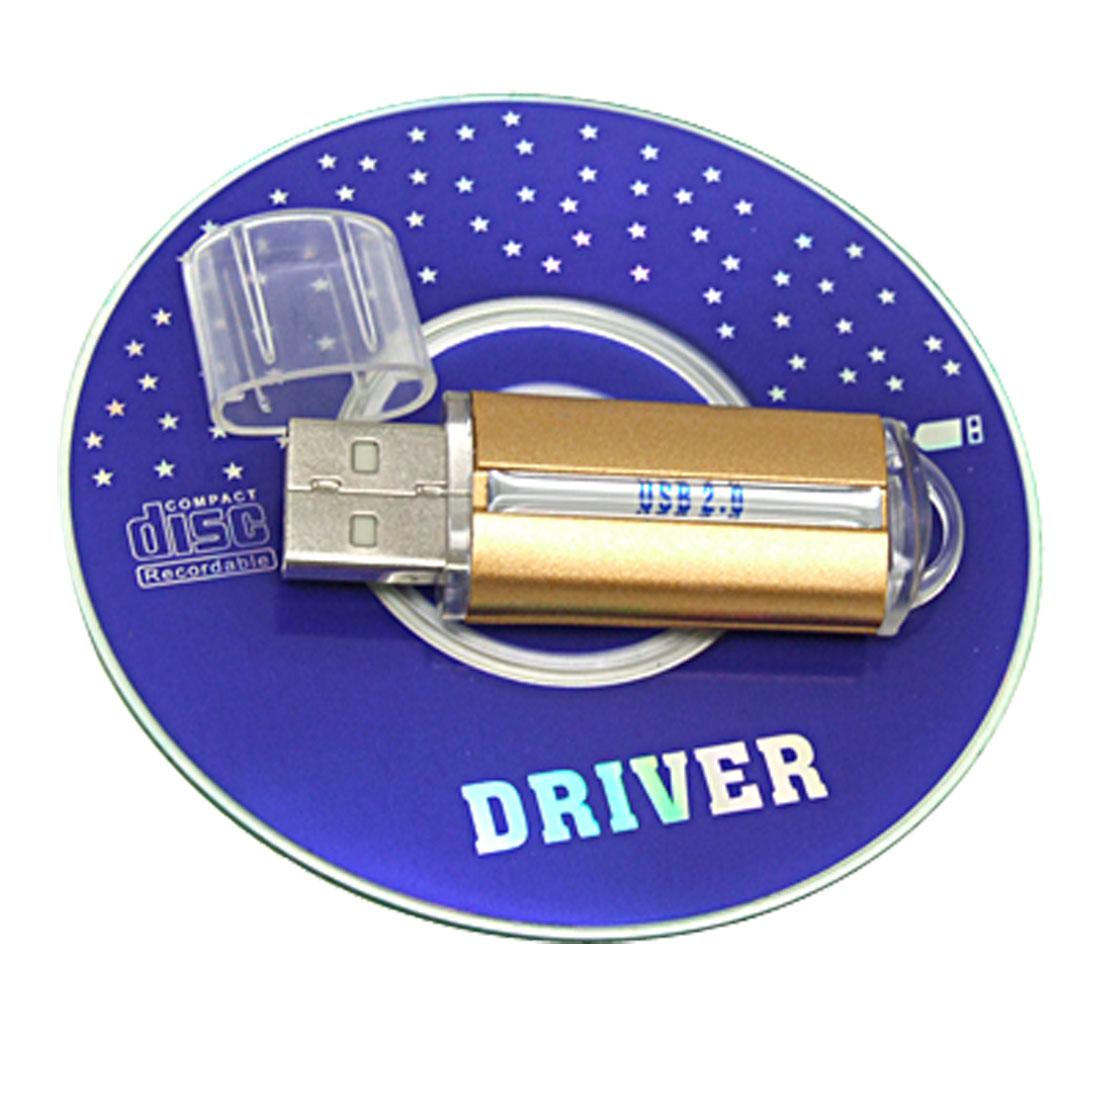 Mini Golden Wireless USB 2.0 bluetooth V2.0 Adapter Dongle